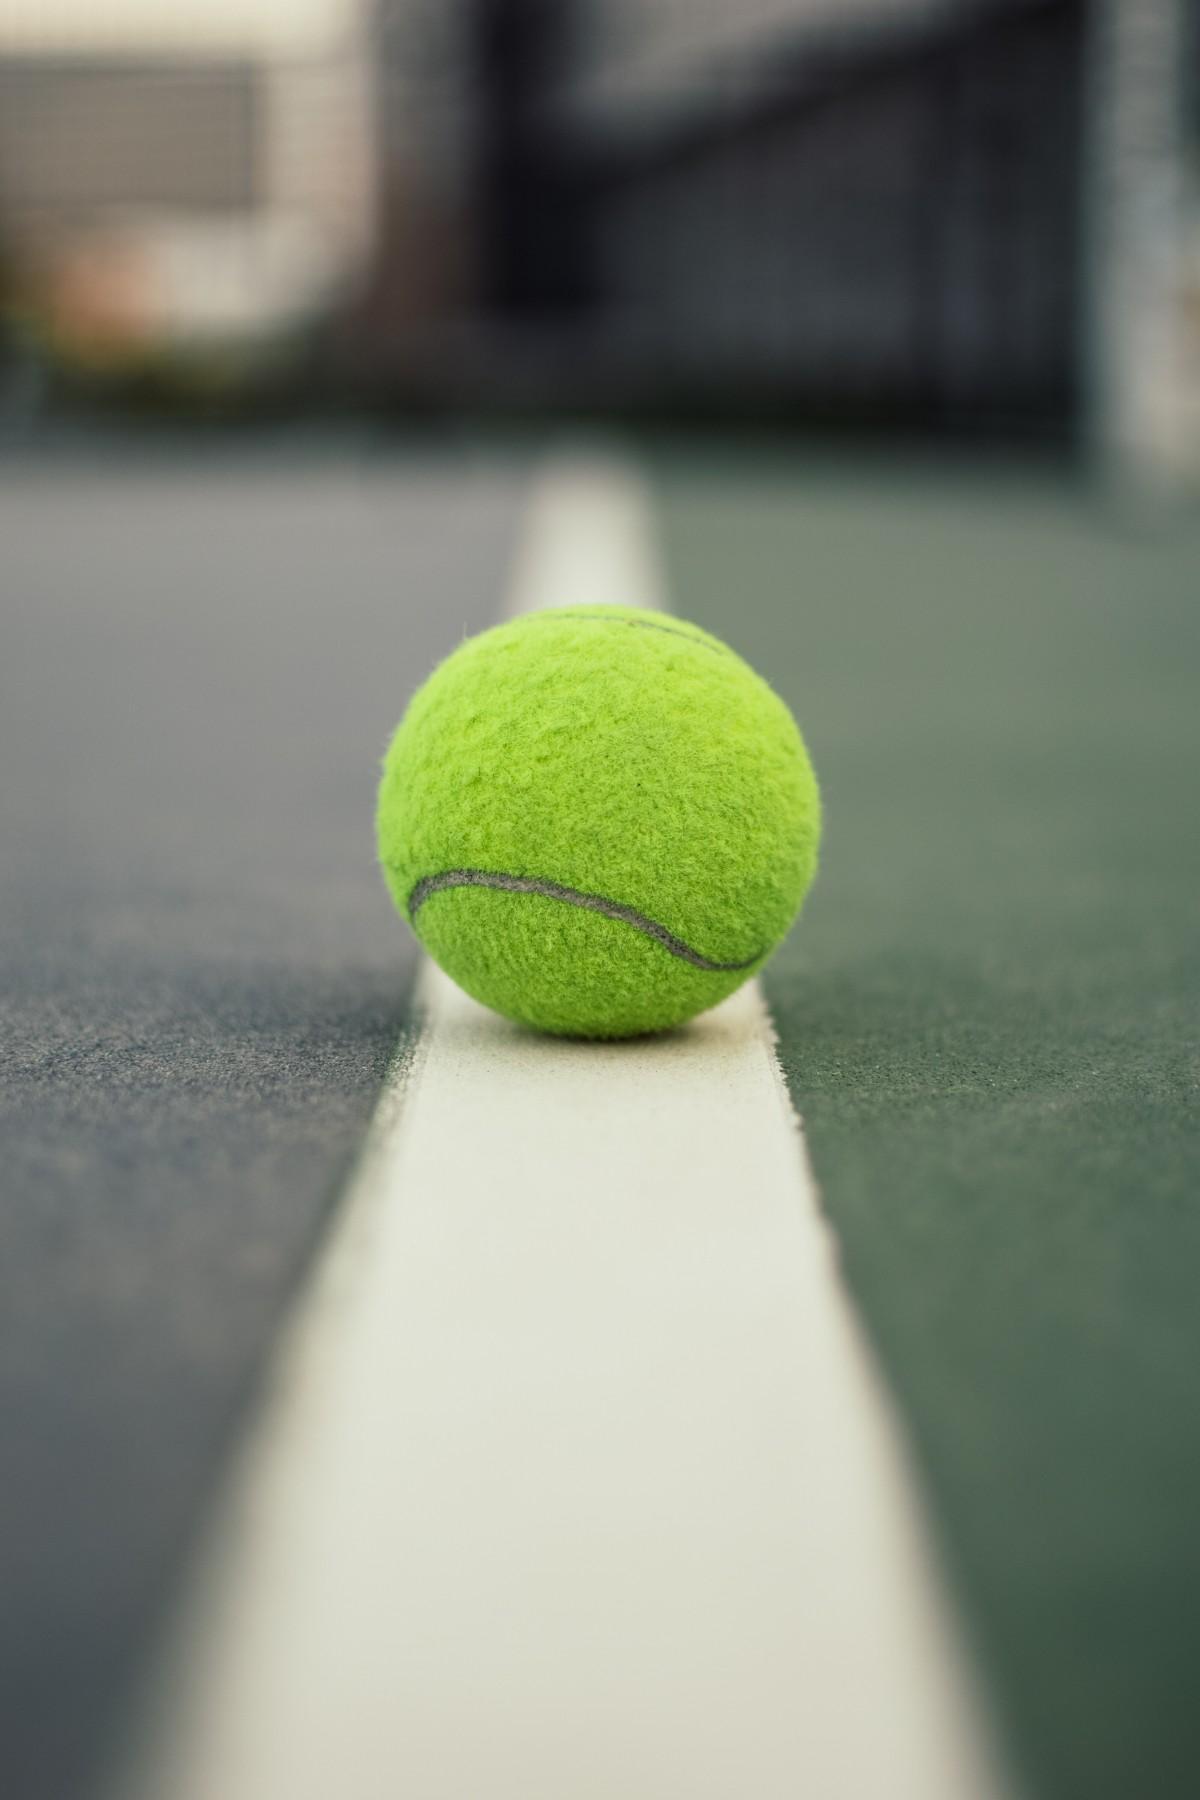 Bola Tenis Lapangan : tenis, lapangan, Gambar, Hijau,, Tenis,, Lapangan, Tempat, Olahraga,, Garis,, Tennis,, Peralatan, Olahraga, Raket,, Tennis, Equipment,, Fotografi, 4000x6000, 1561211, Galeri, PxHere